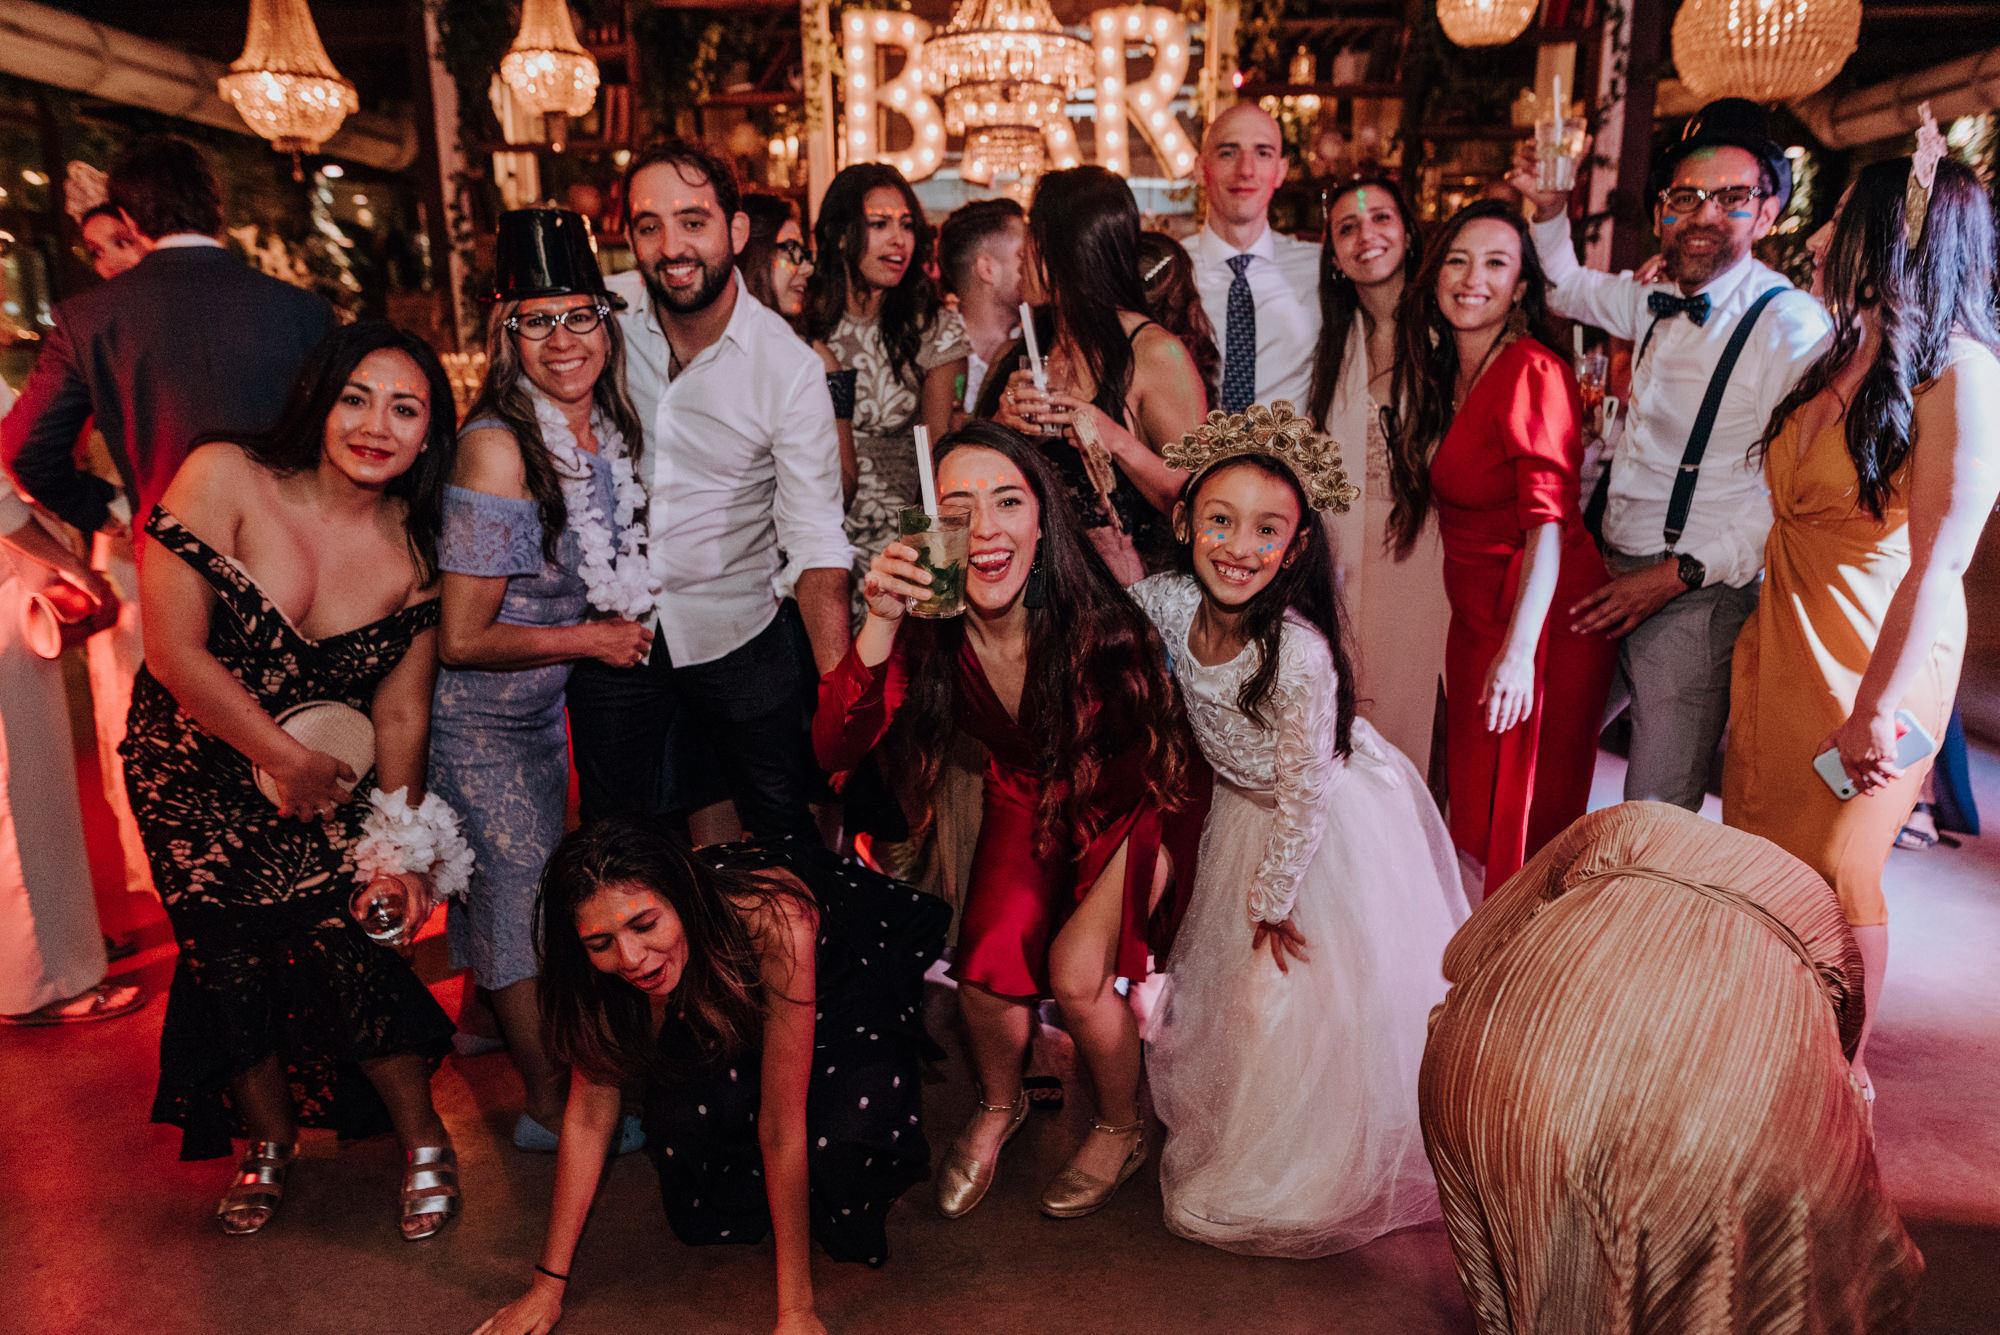 FOTO+PHOTO+BODA+WEDDING+ITALIA+ITALY+MAURICIO+GARAY+MAURICIOGARAY+WEDDINPHOTOGRAPHER+FOTOGRAFODEBODA-2260.jpg